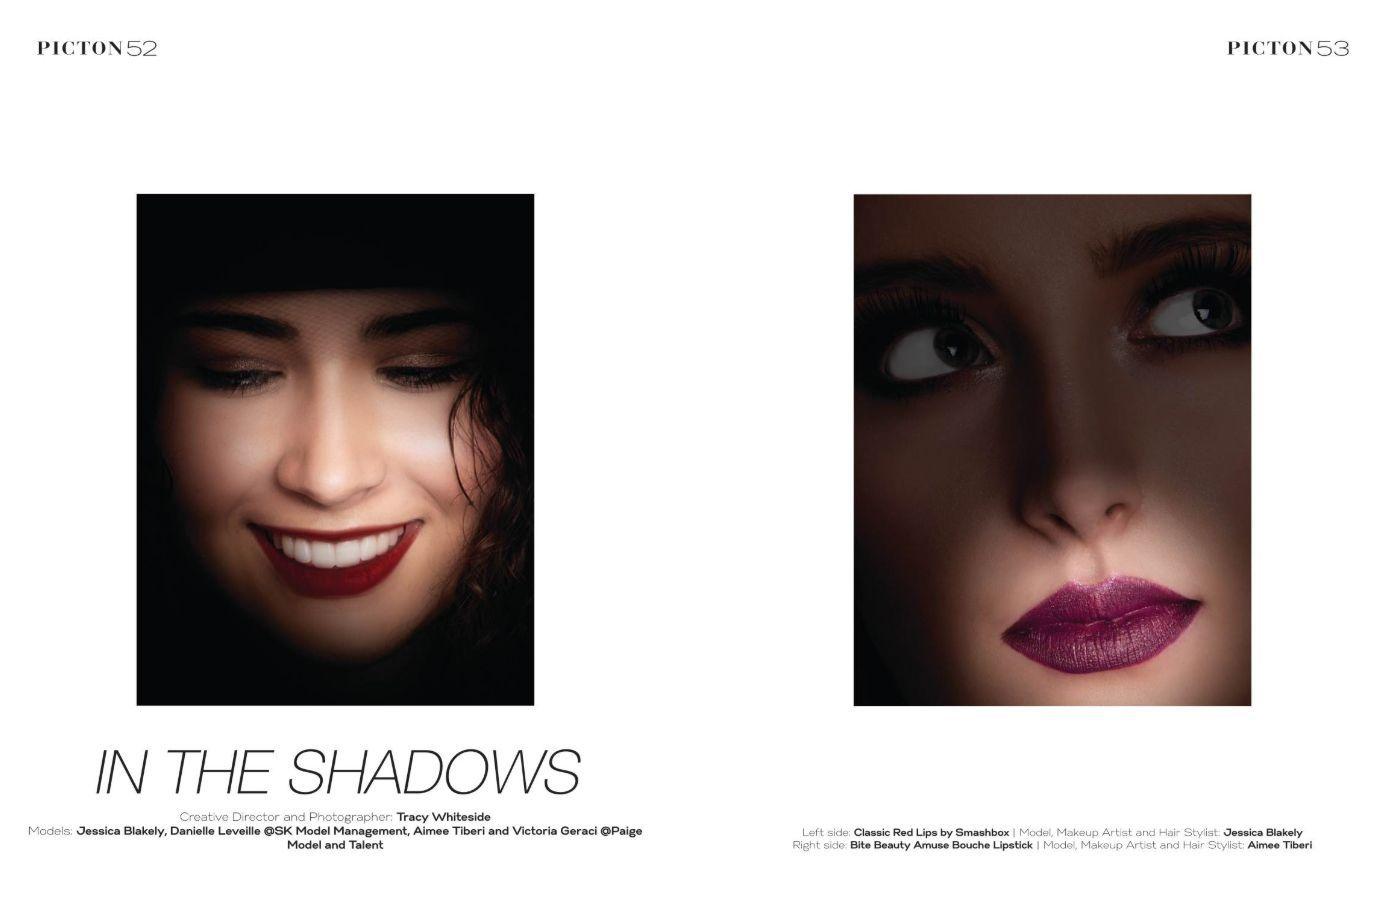 Picton Magazine Beauty Editorial Beautyphotographer Beautyphoto Beautyphotoshoot Beautyphotography B Beauty Photoshoot Beauty Portrait Conceptual Artist